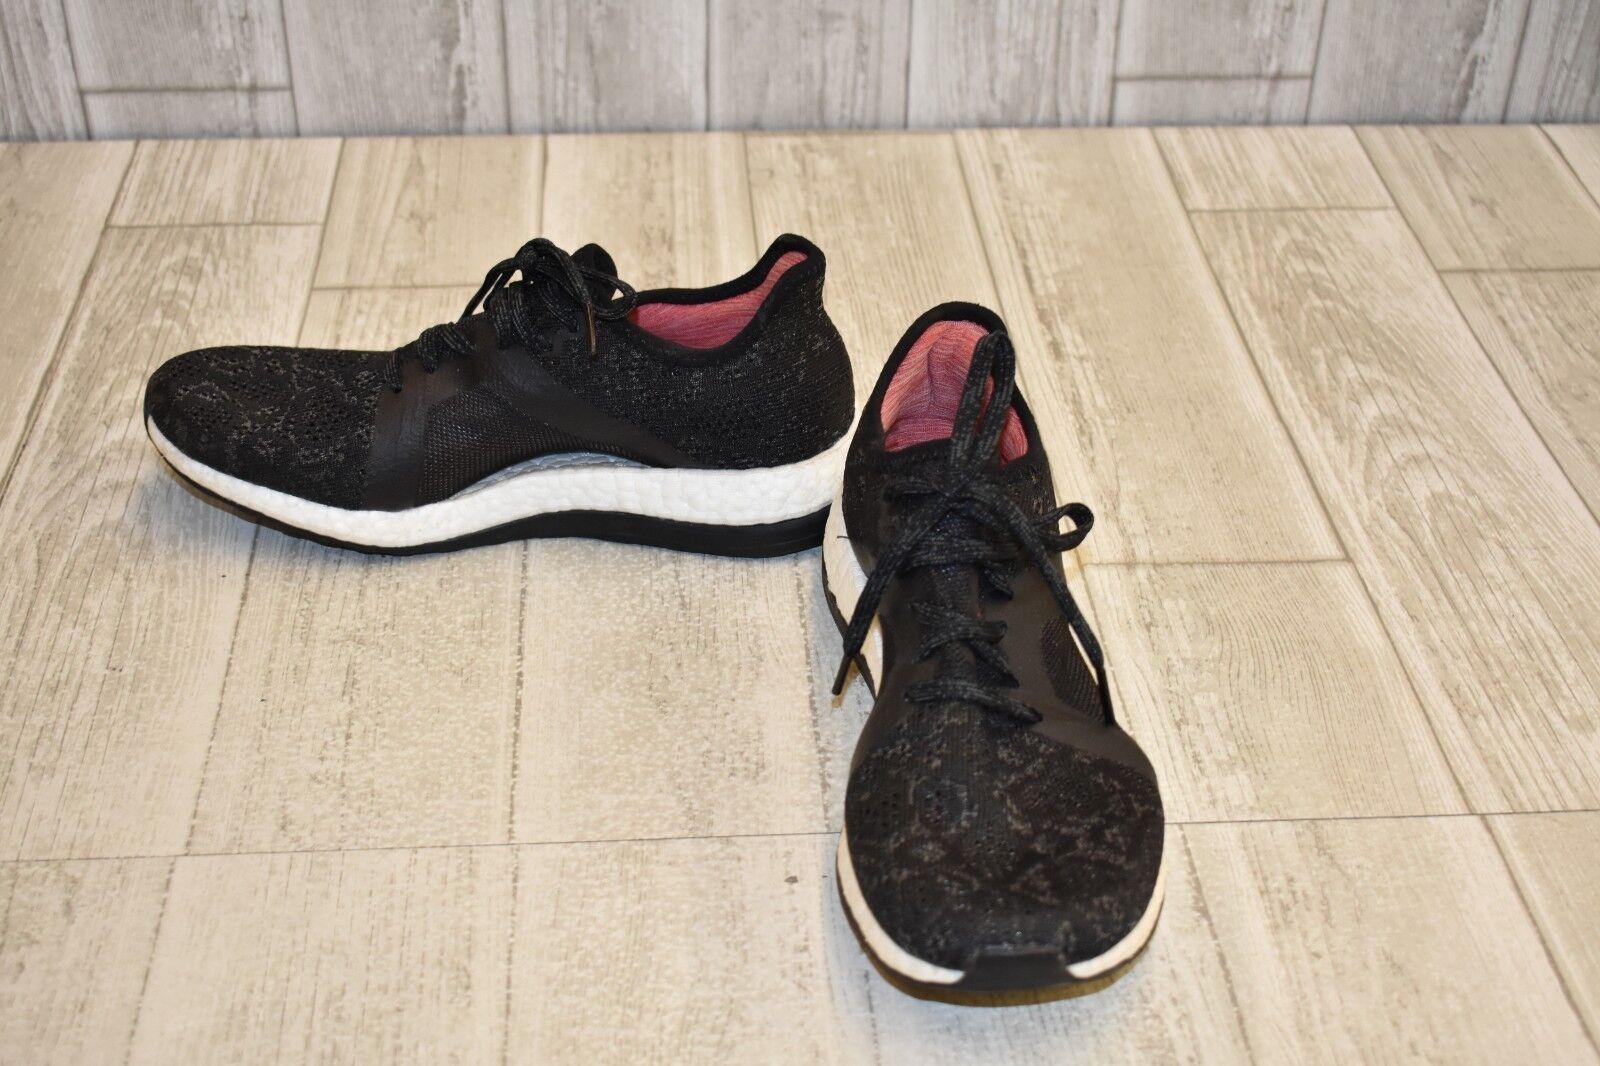 Zapatillas de running Adidas Pure Boost X Element - Talla 8.5 para mujer, negro / blanco